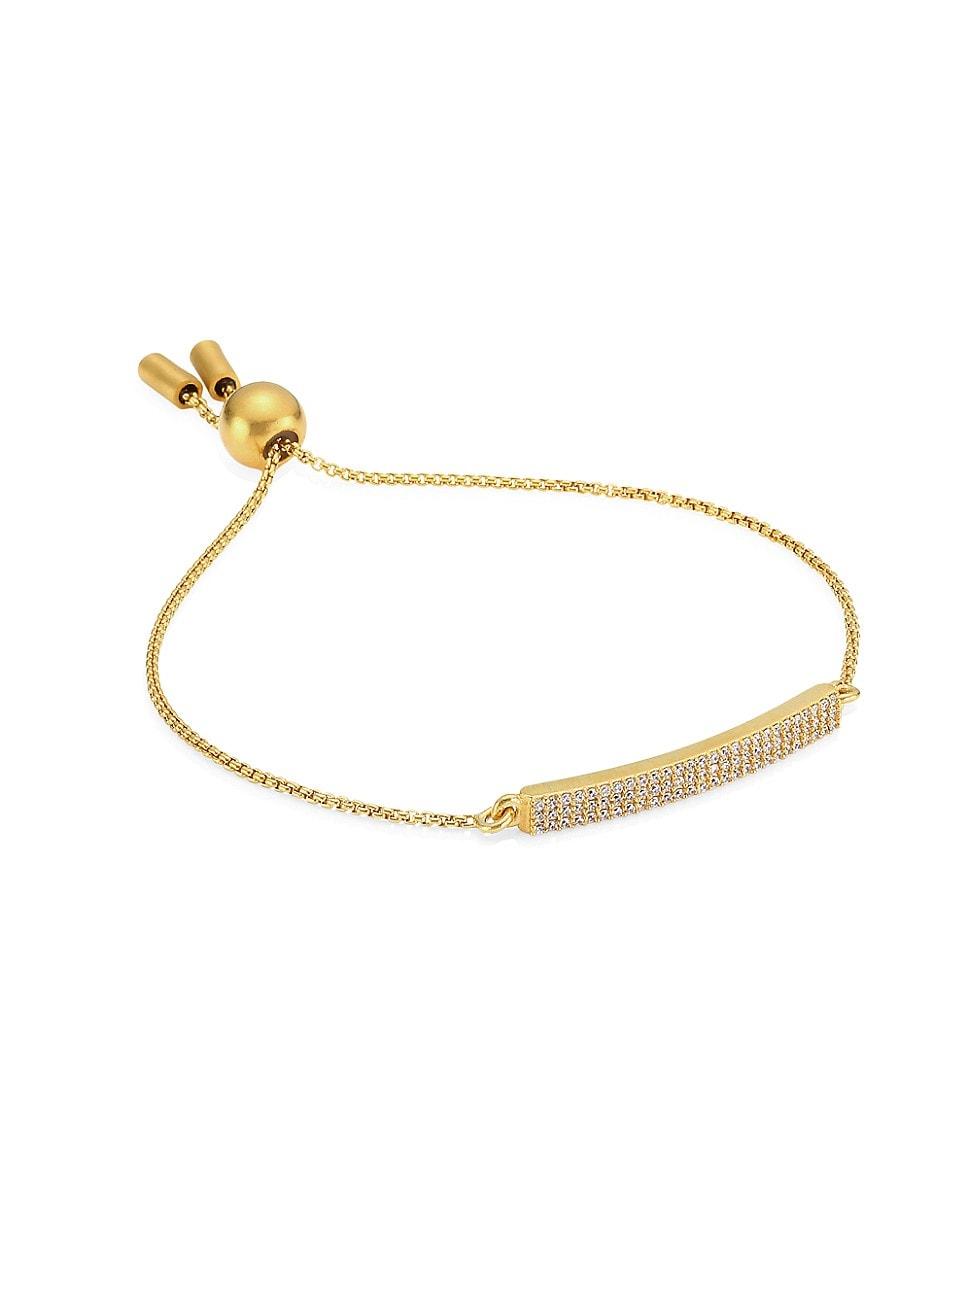 Dean Davidson Women's 22k Yellow Goldplated & Cubic Zirconia Pavé Bar Chain Bracelet